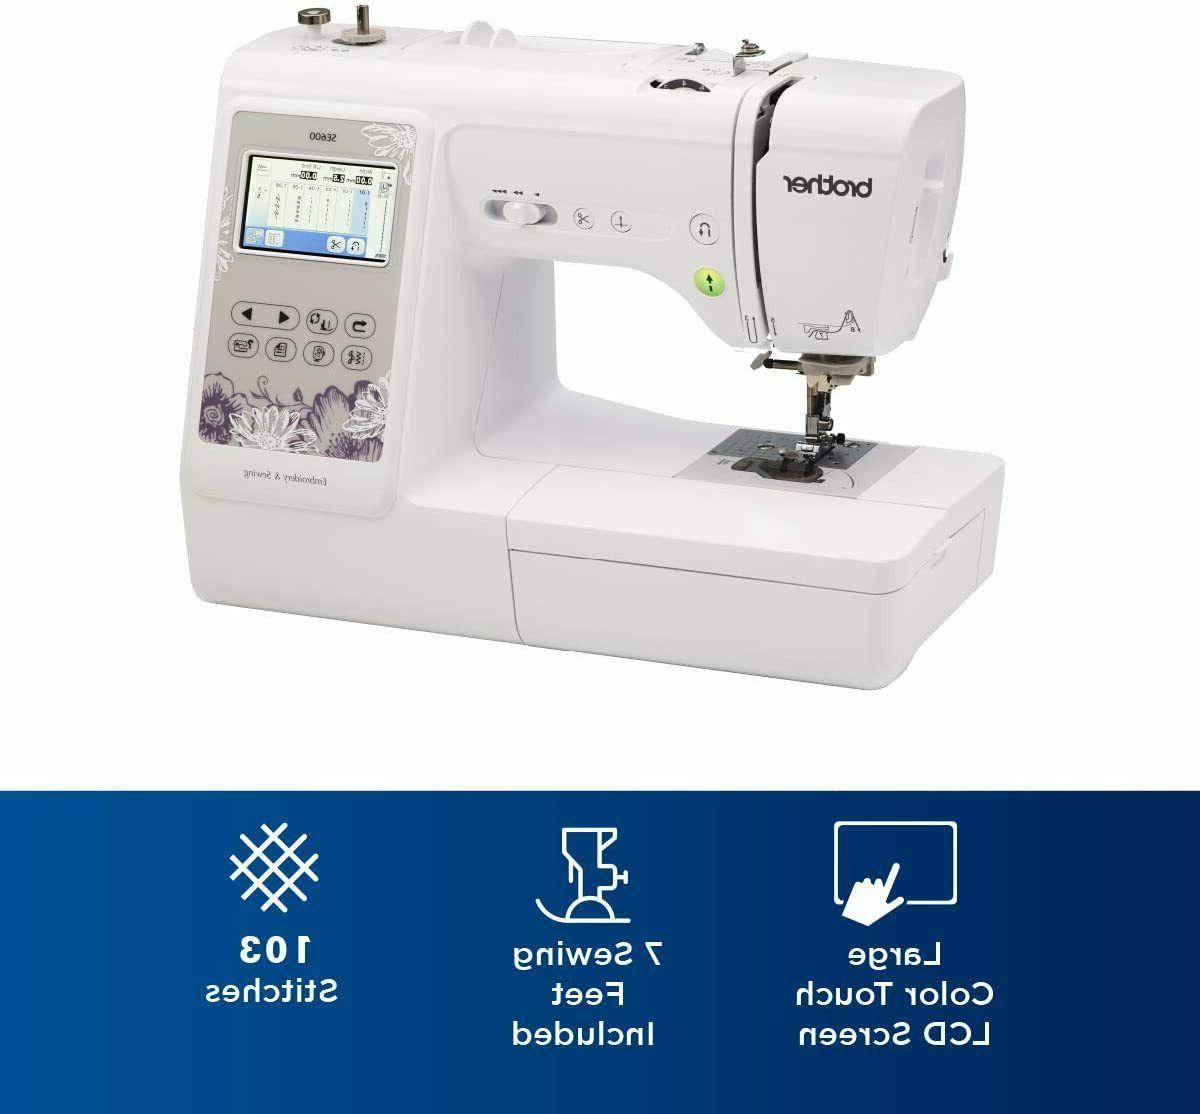 New SE600 Combo Computerized & Embroidery Machine Free